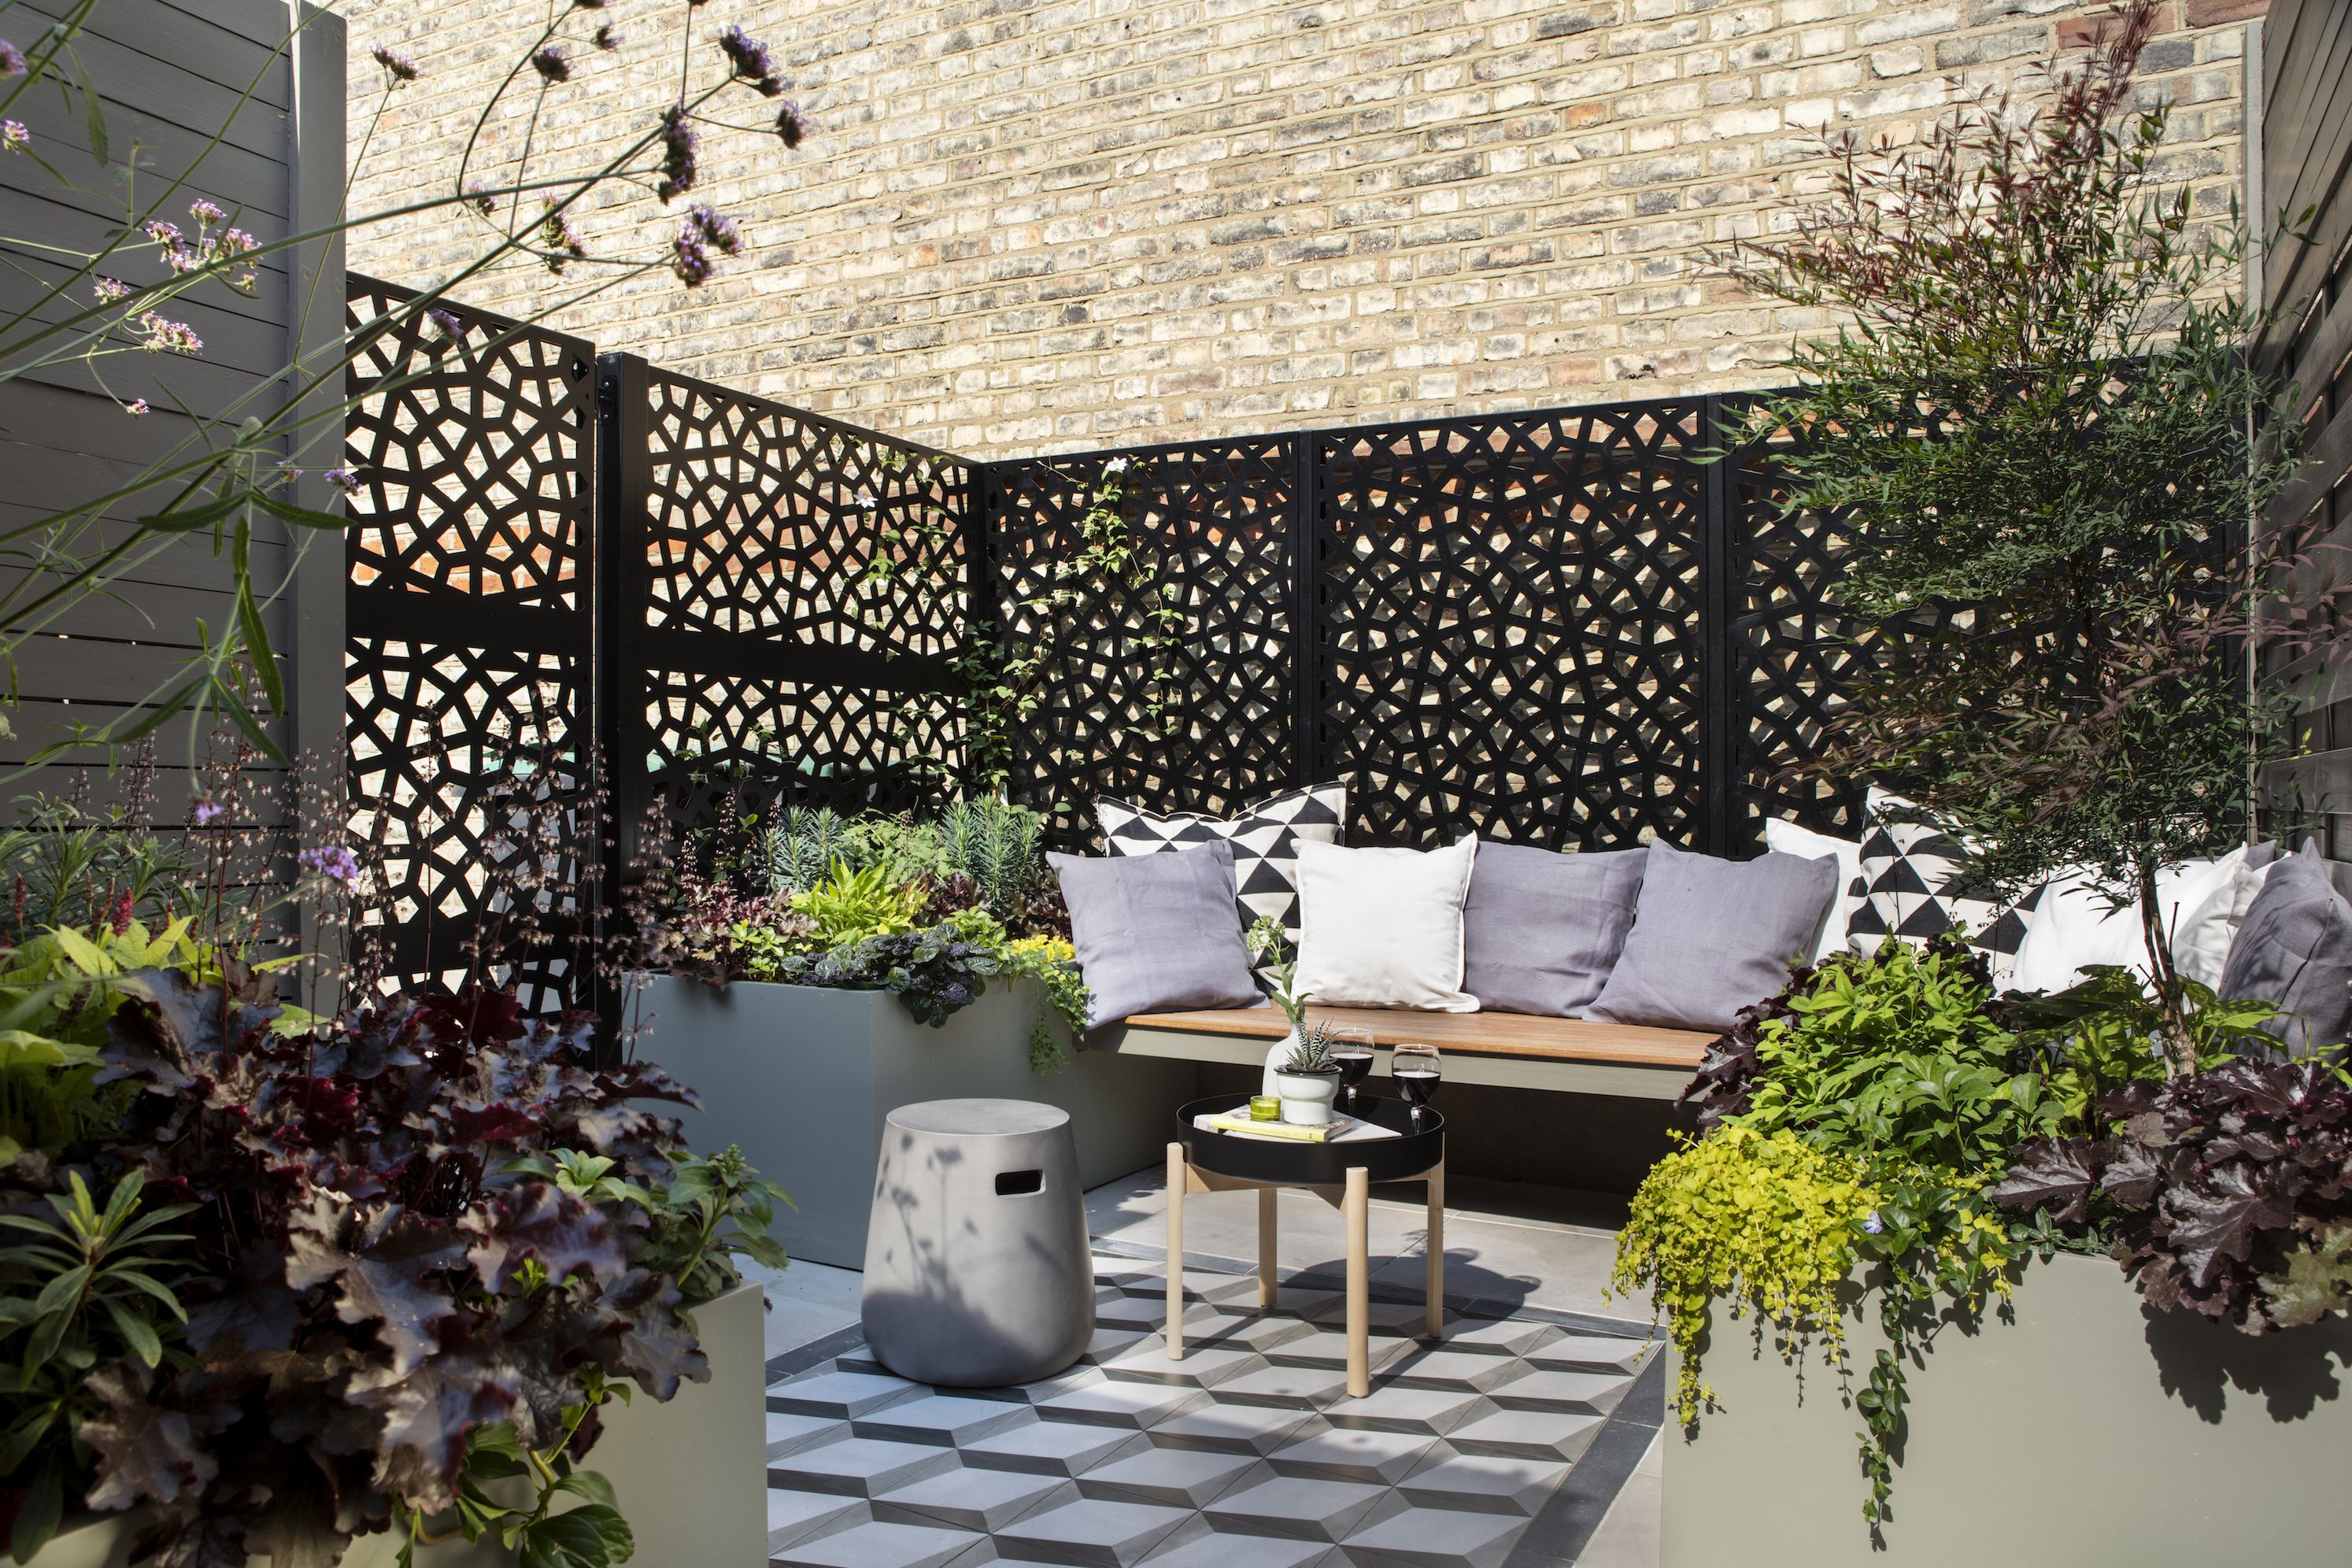 Photos: Small L-shaped plot transformed into chic city garden